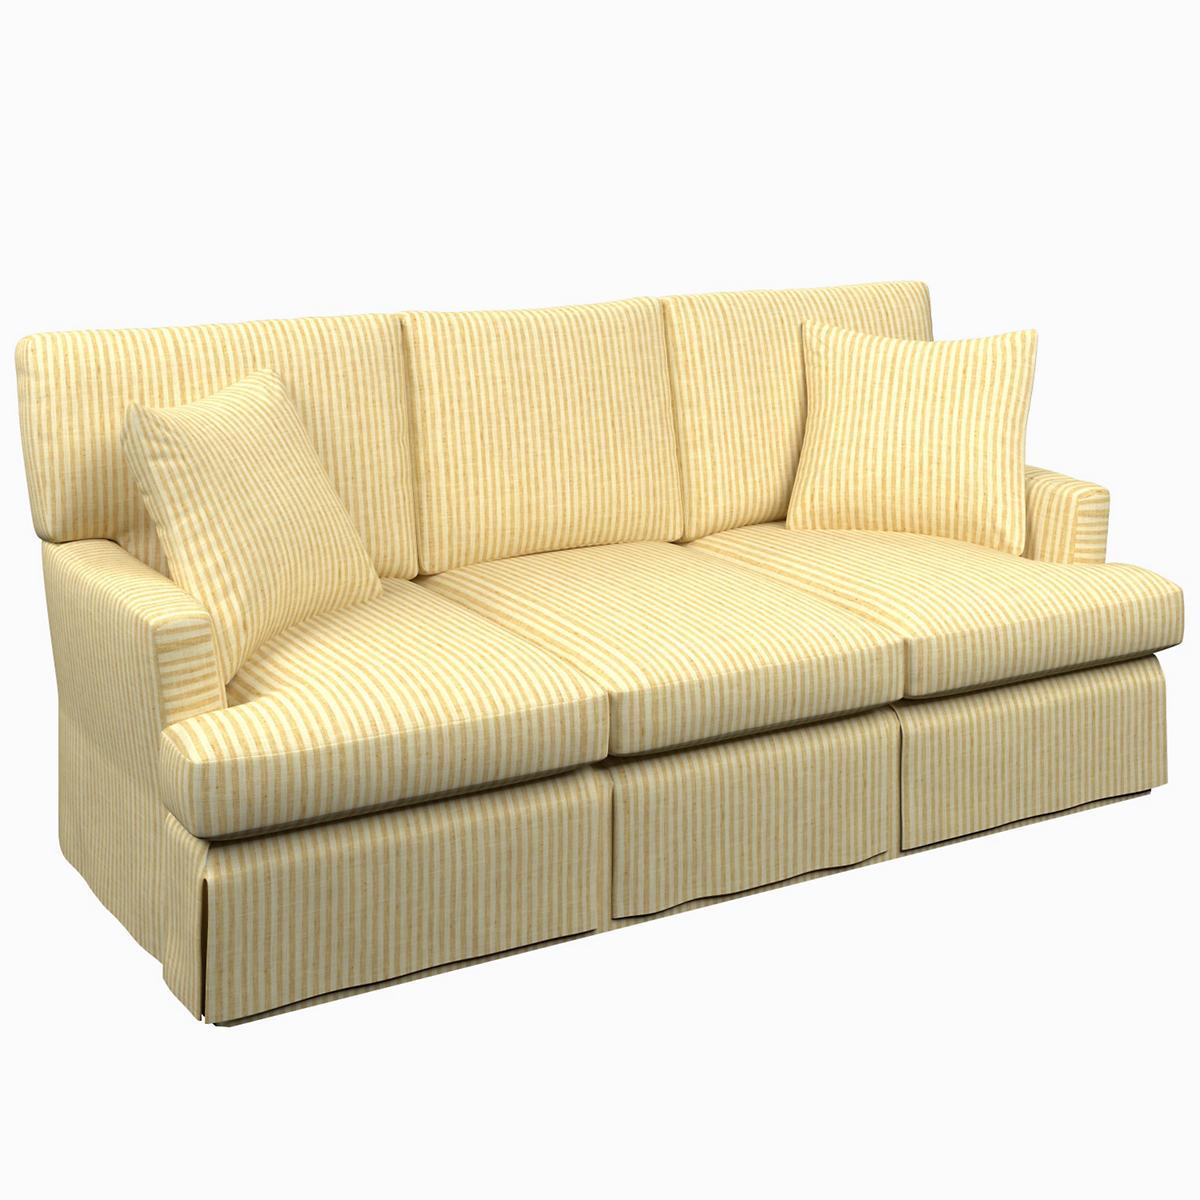 Adams Ticking Gold Saybrook 3 Seater Slipcovered Sofa